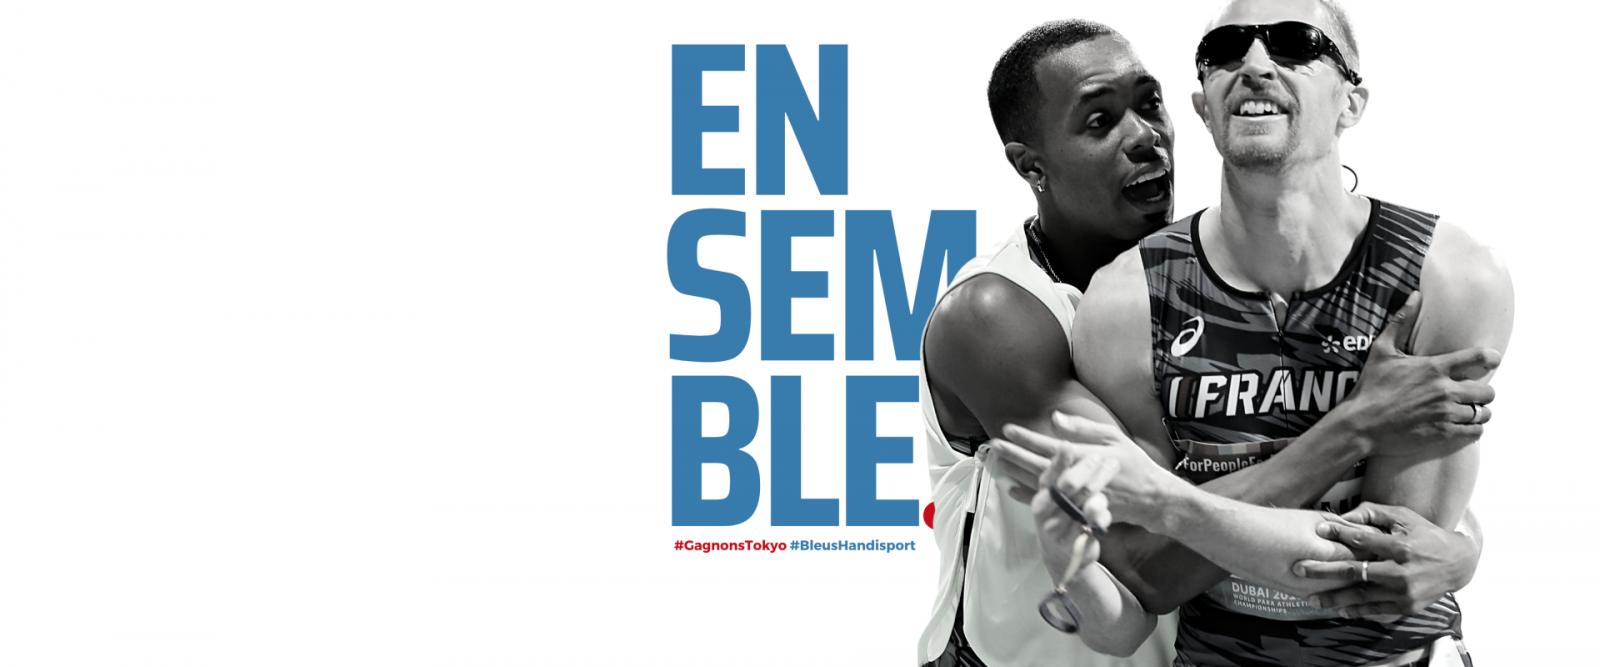 Campagne Bleus Handisport 2021, Gagnons Tokyo !